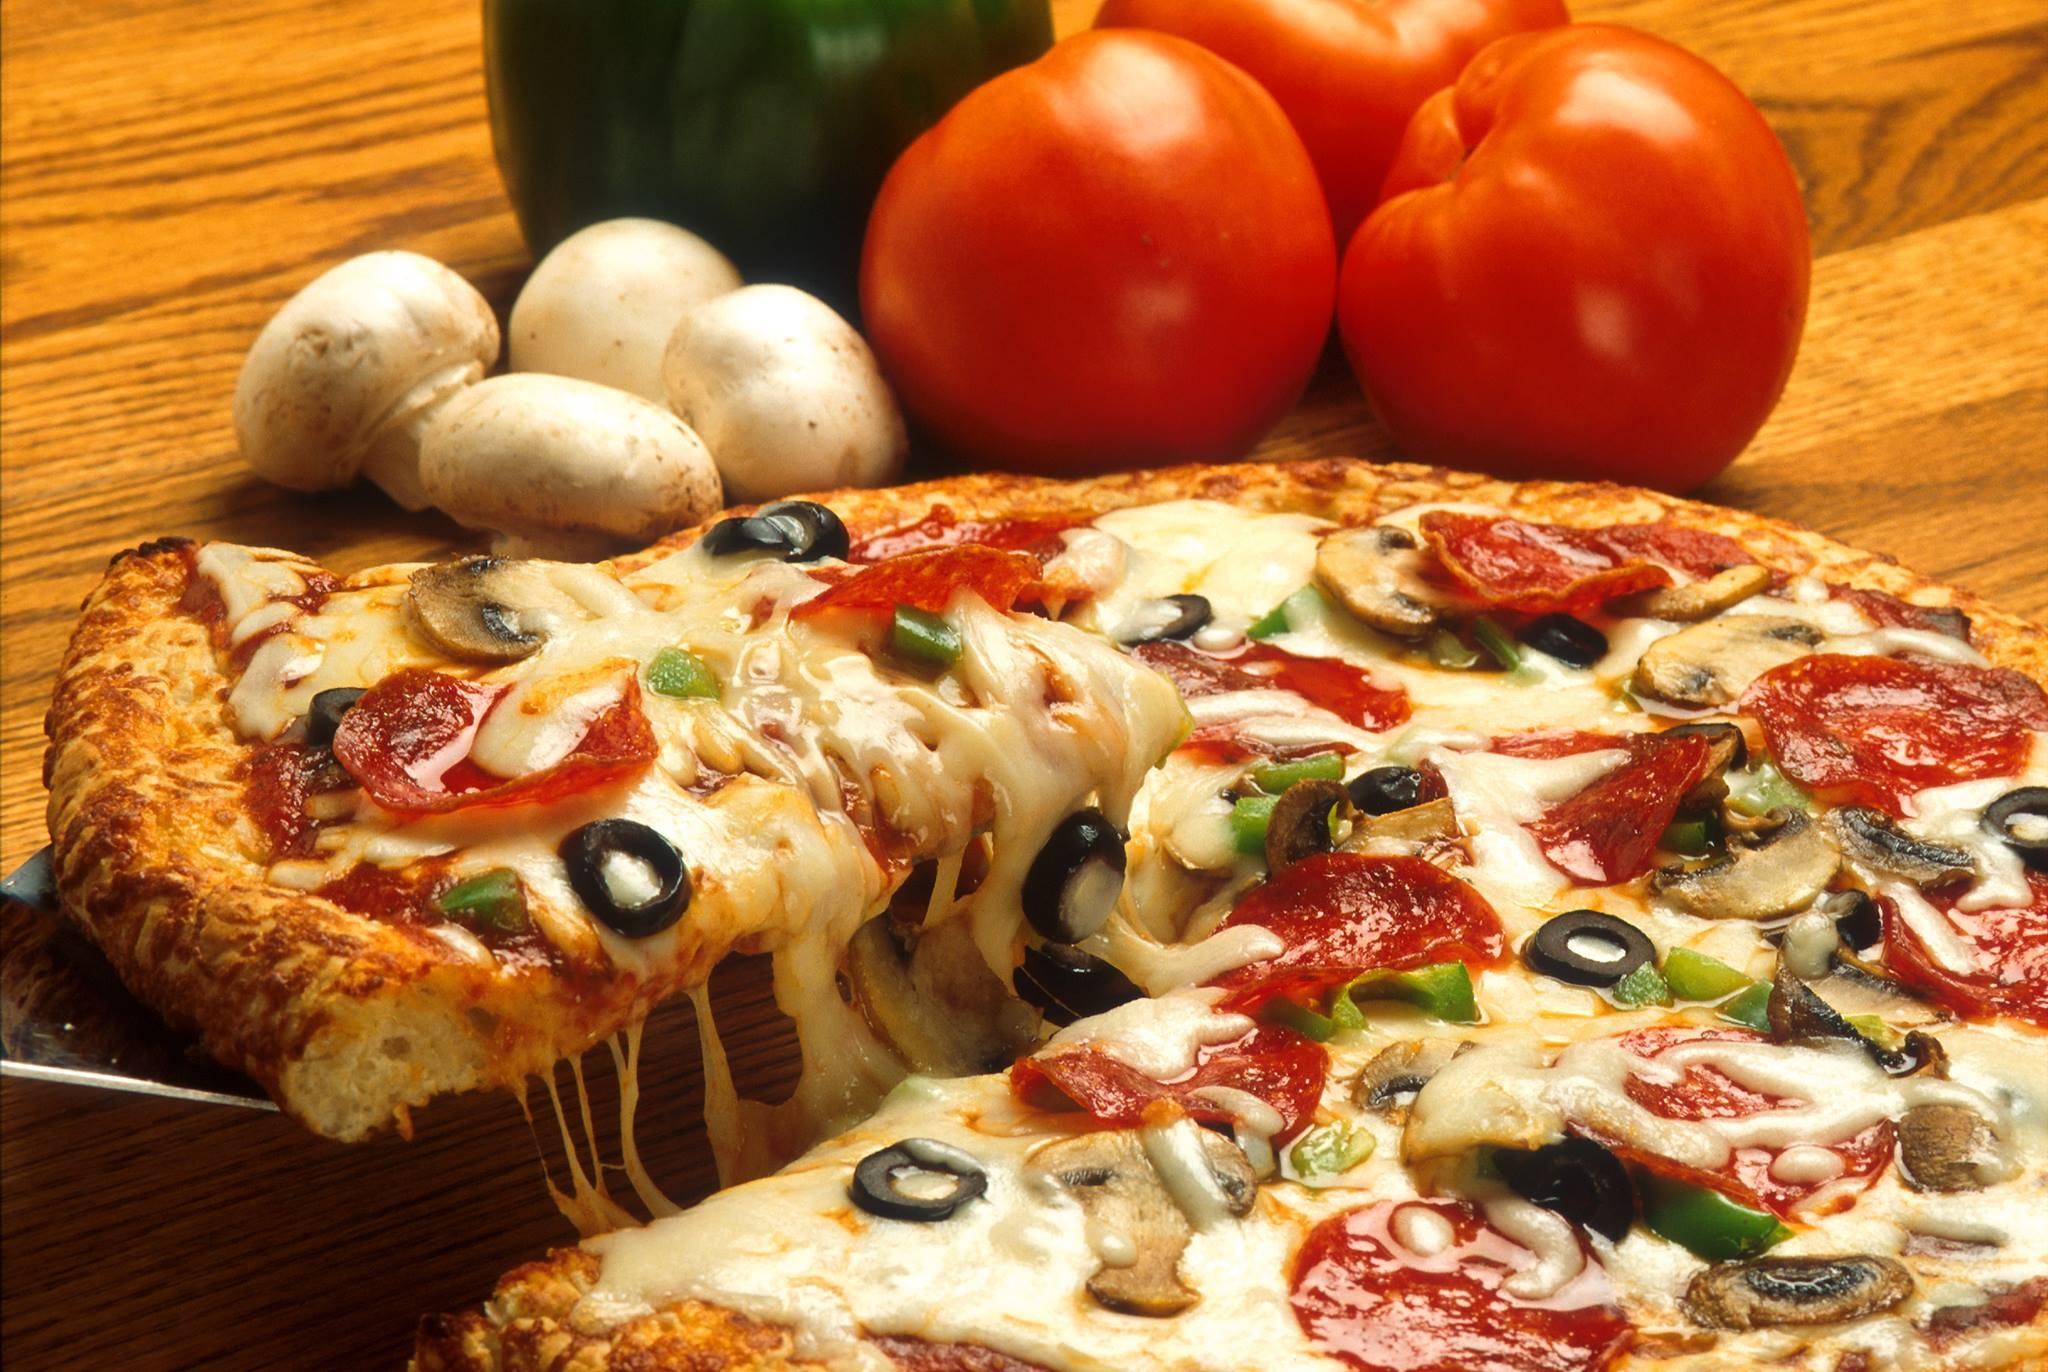 Charlie's Pizza Restaurant & Pub image 2